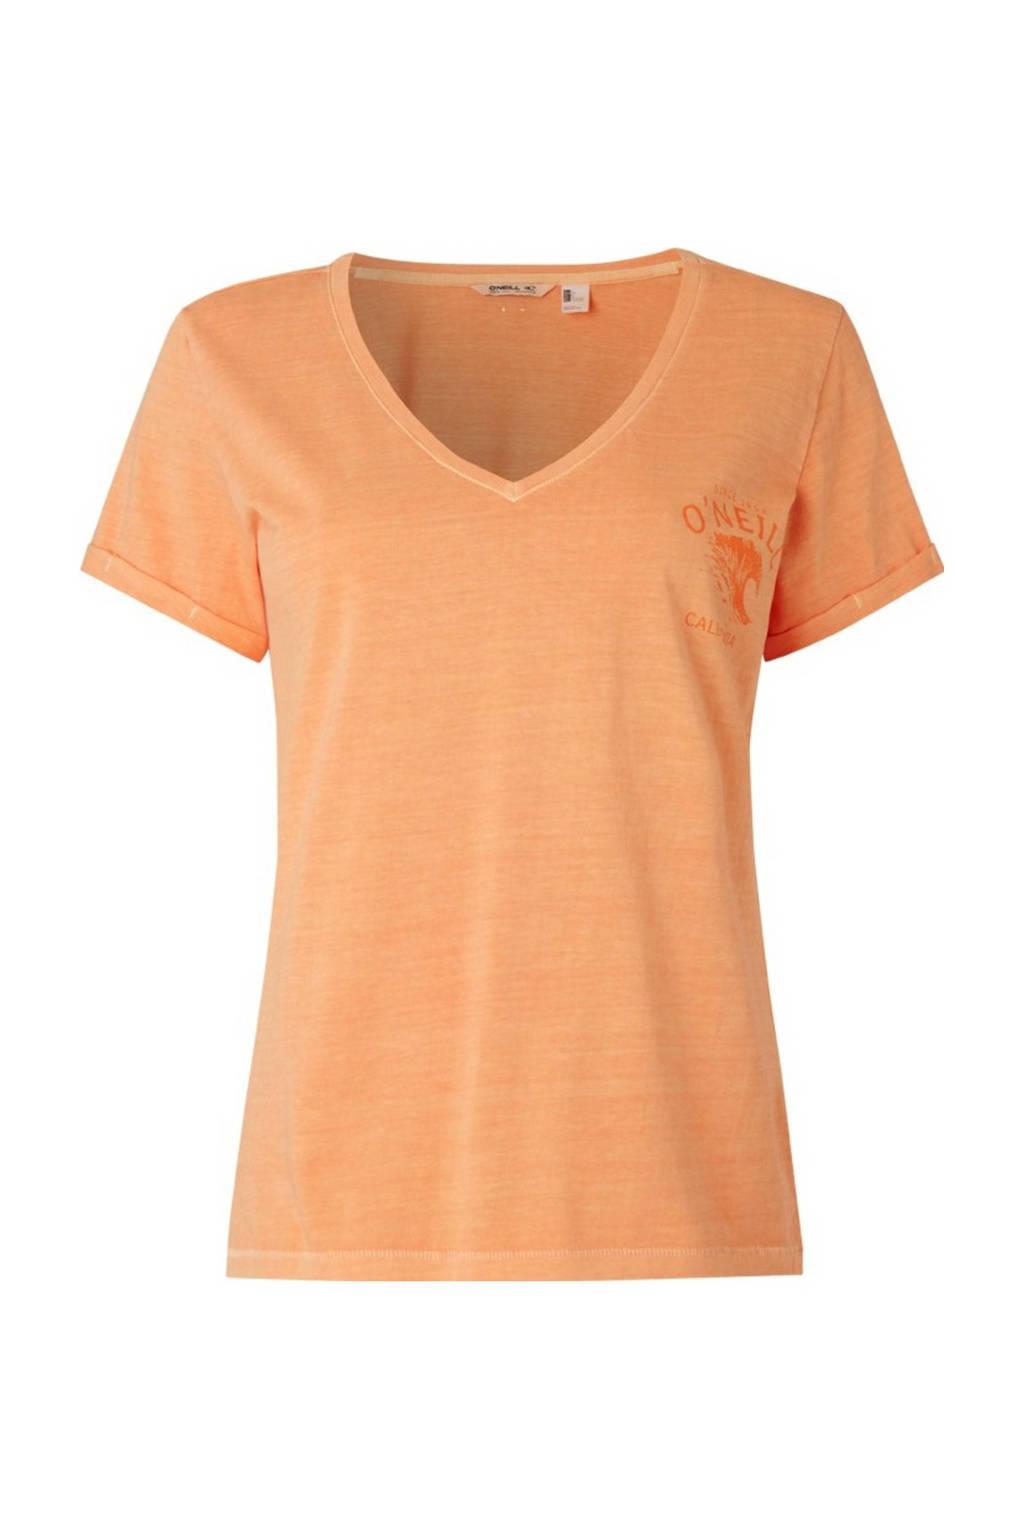 O'Neill T-shirt Giulia oranje, Oranje